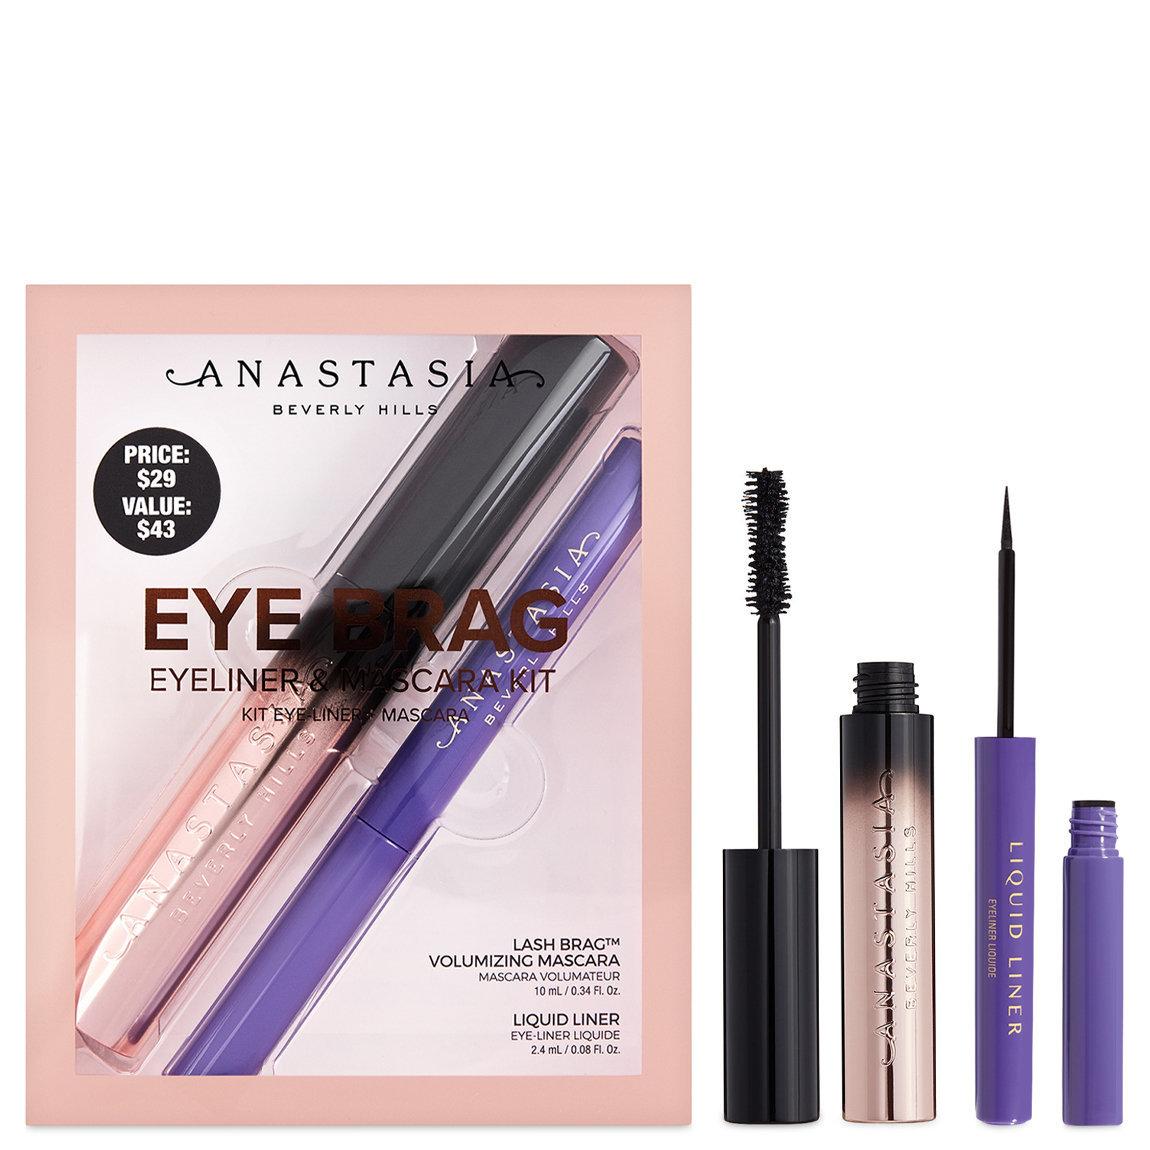 Anastasia Beverly Hills Eye Brag Eyeliner + Mascara Kit alternative view 1 - product swatch.